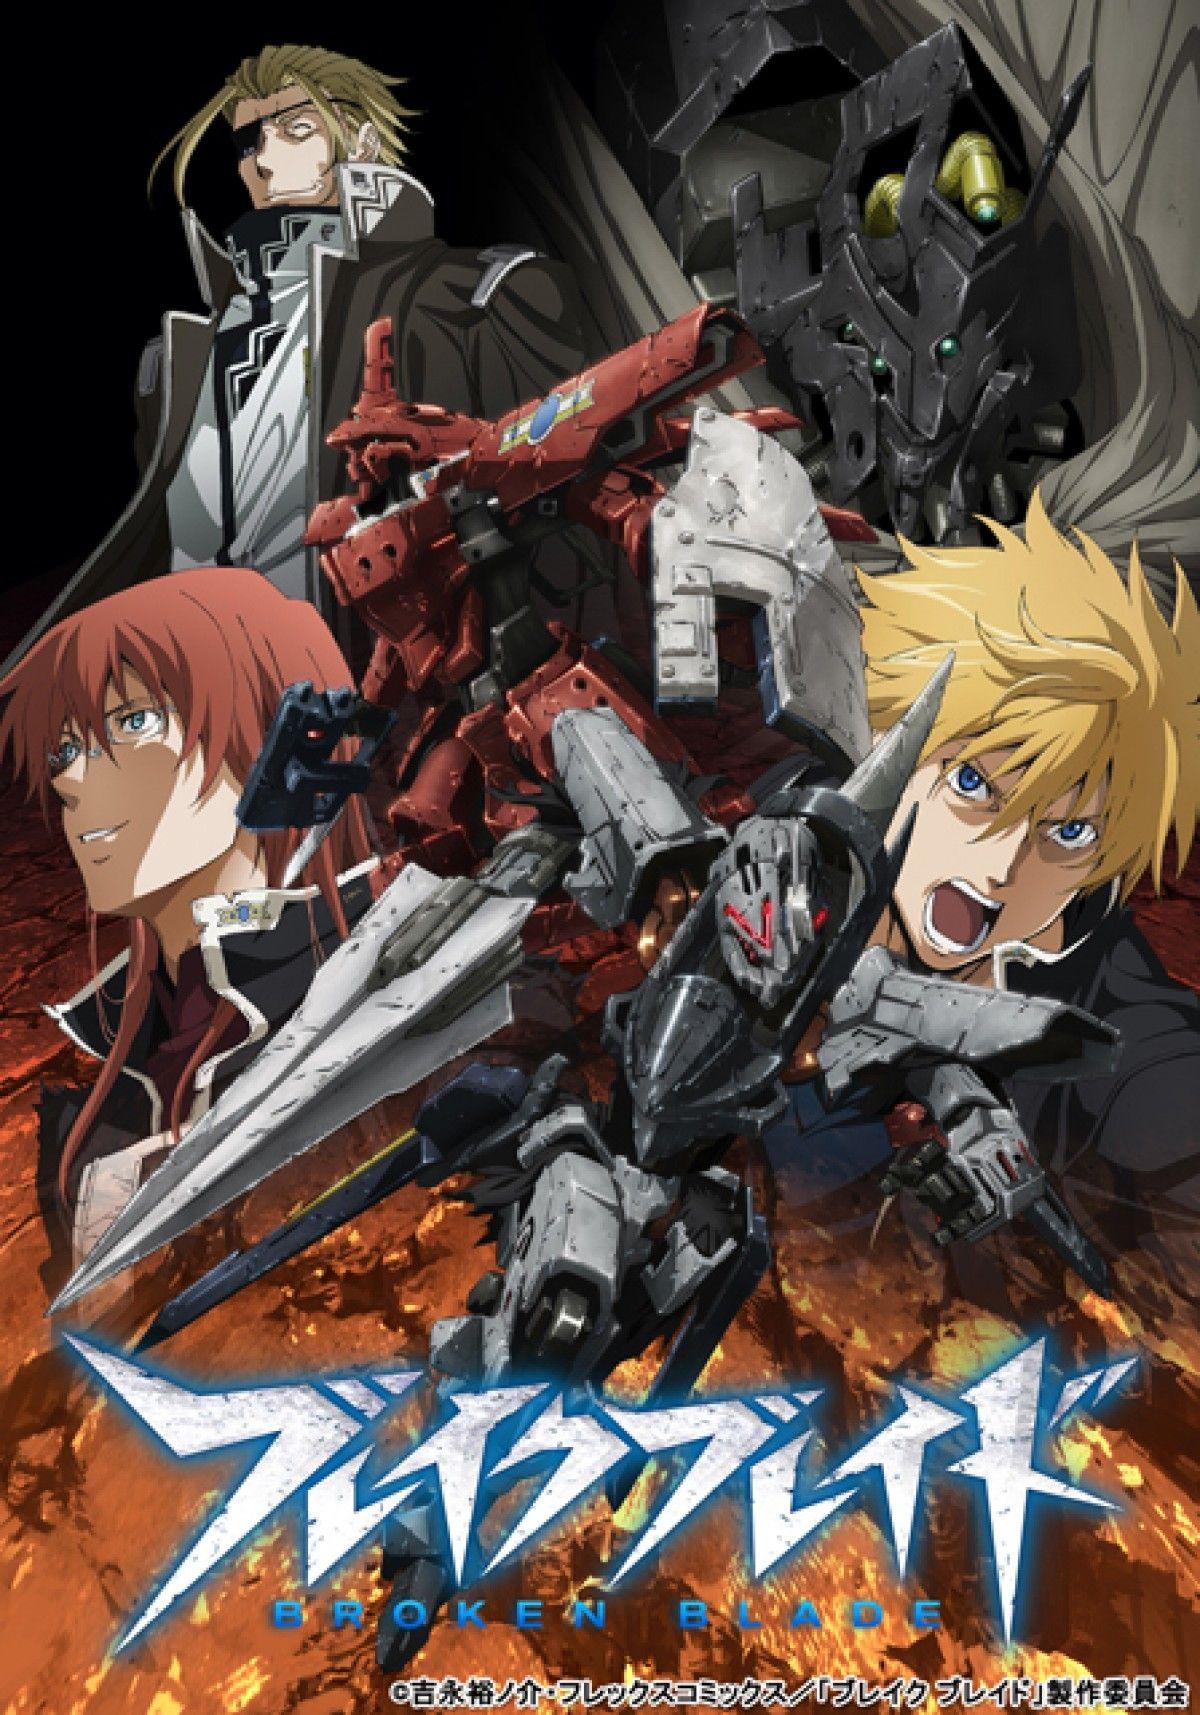 Top 19 Anime Series With Giant Robots Broken blade